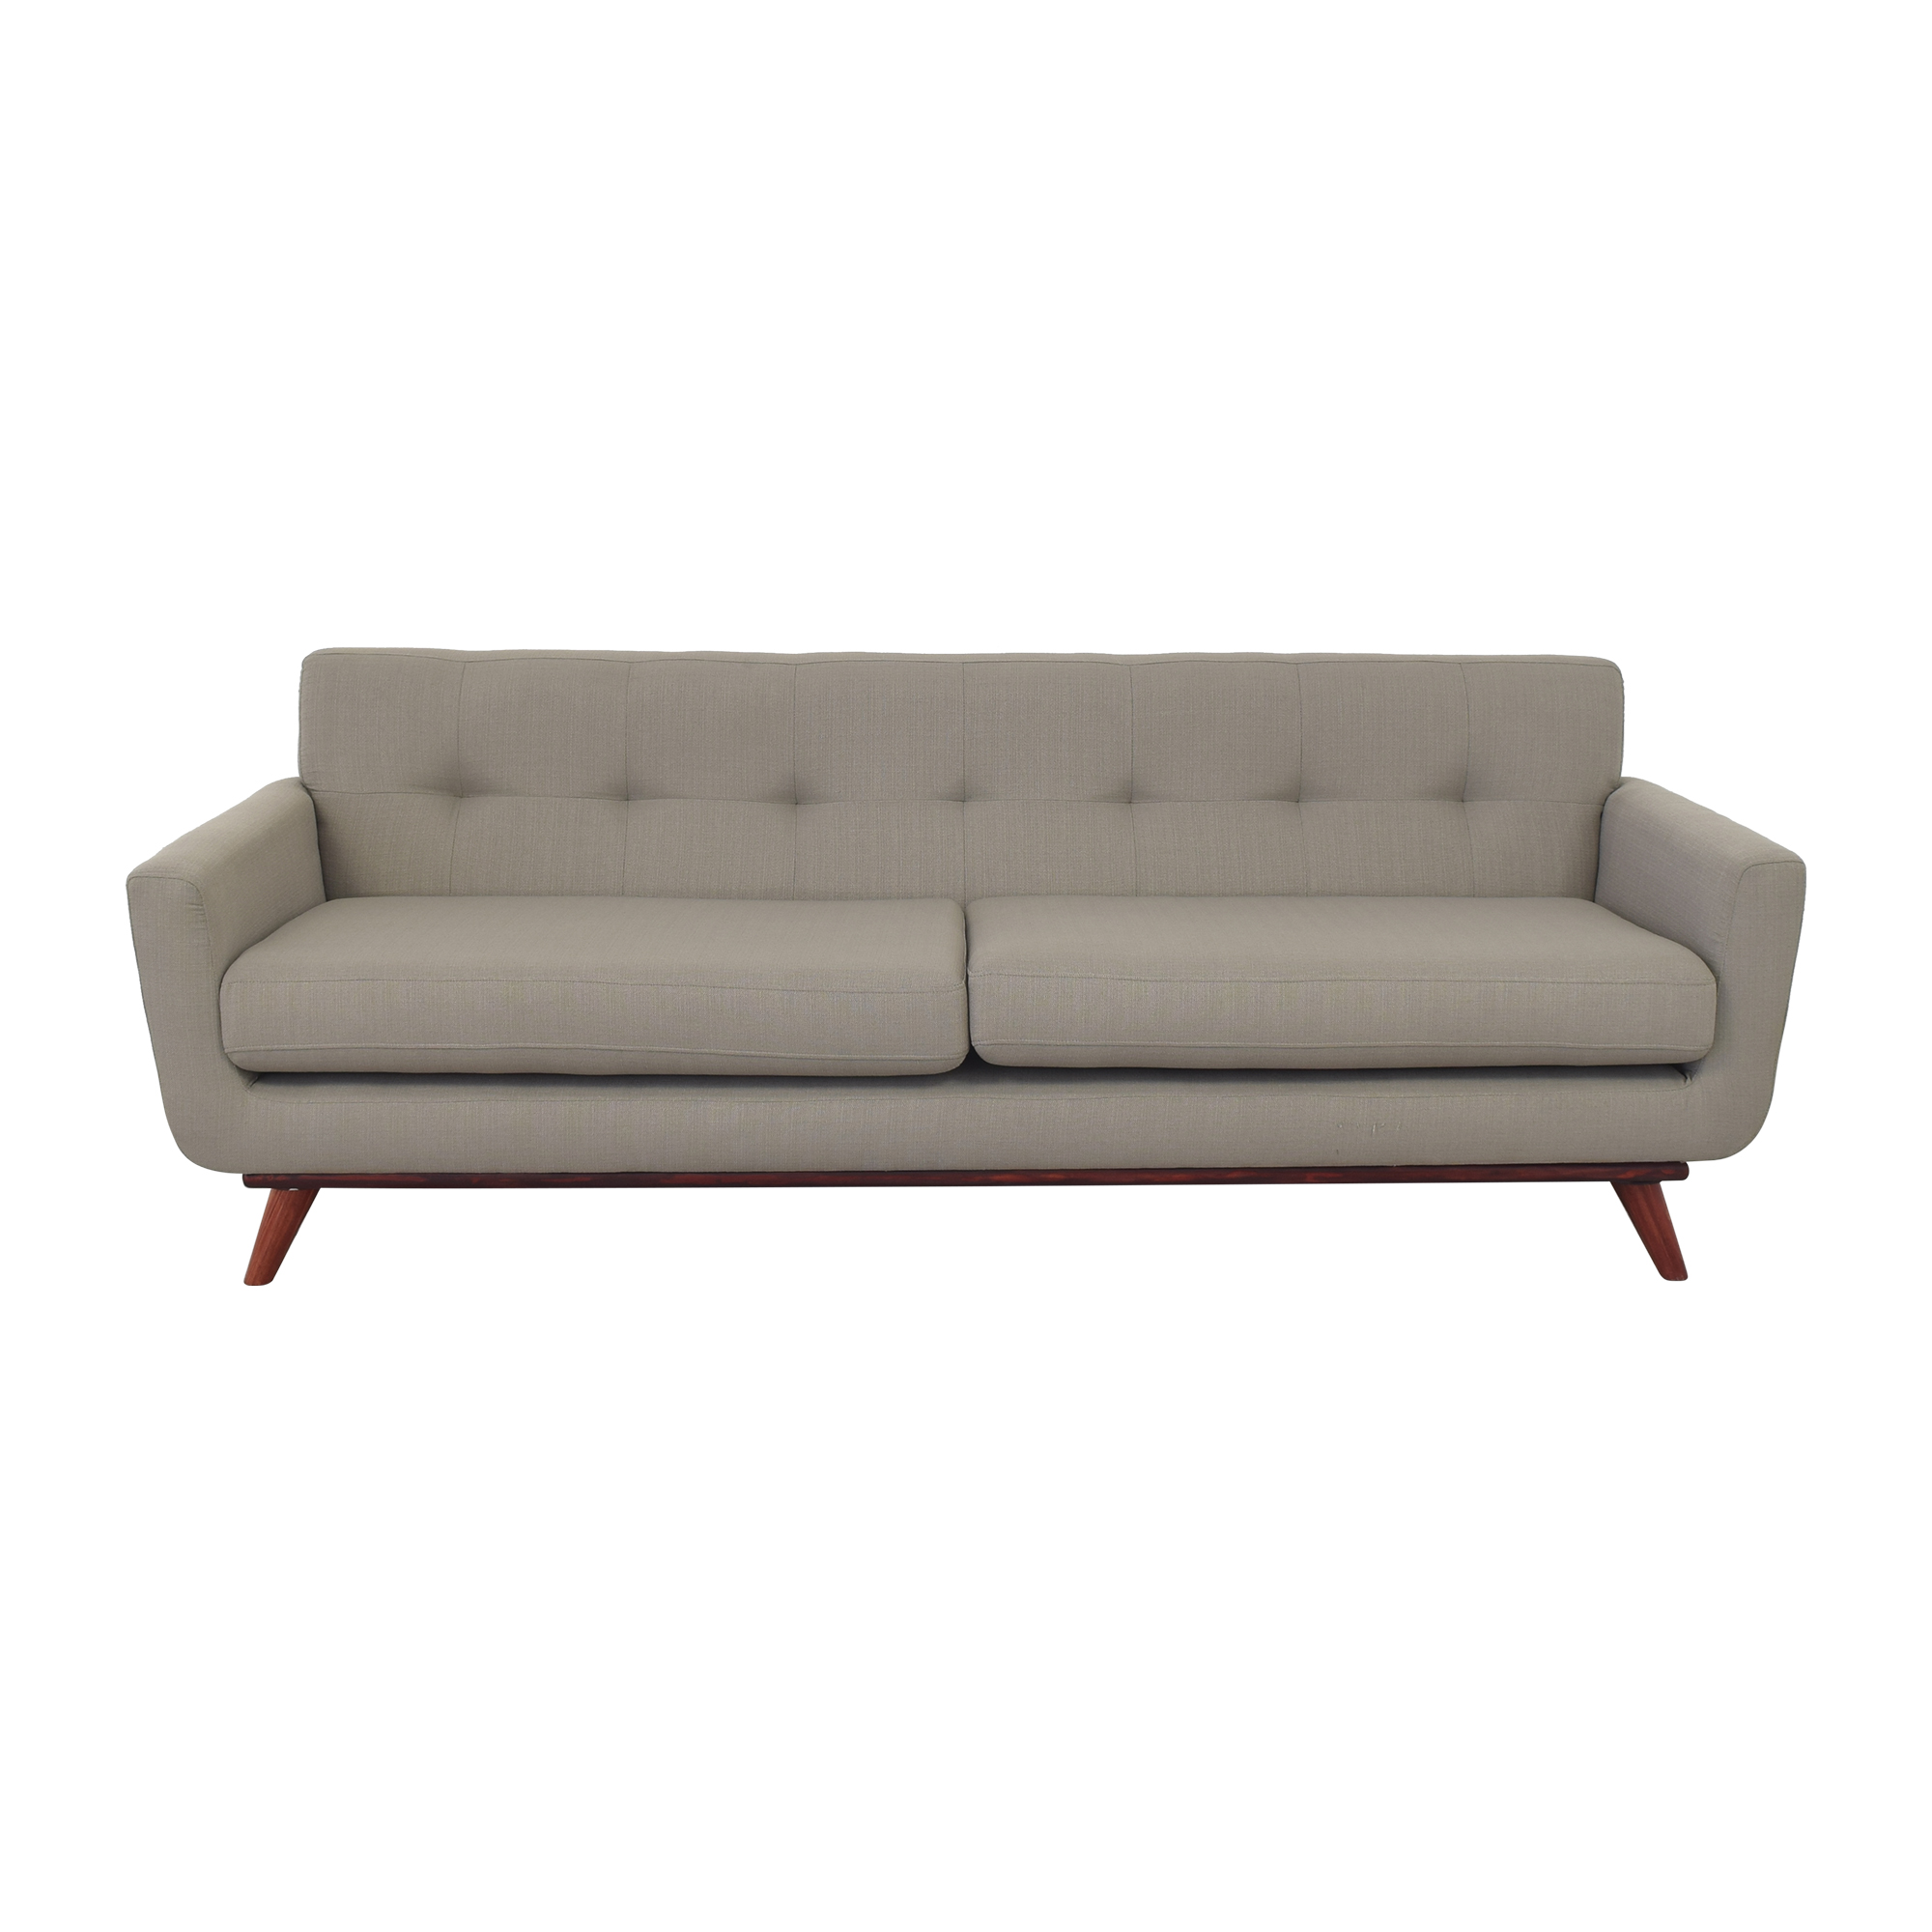 Mid Century Modern Two Cushion Sofa ma